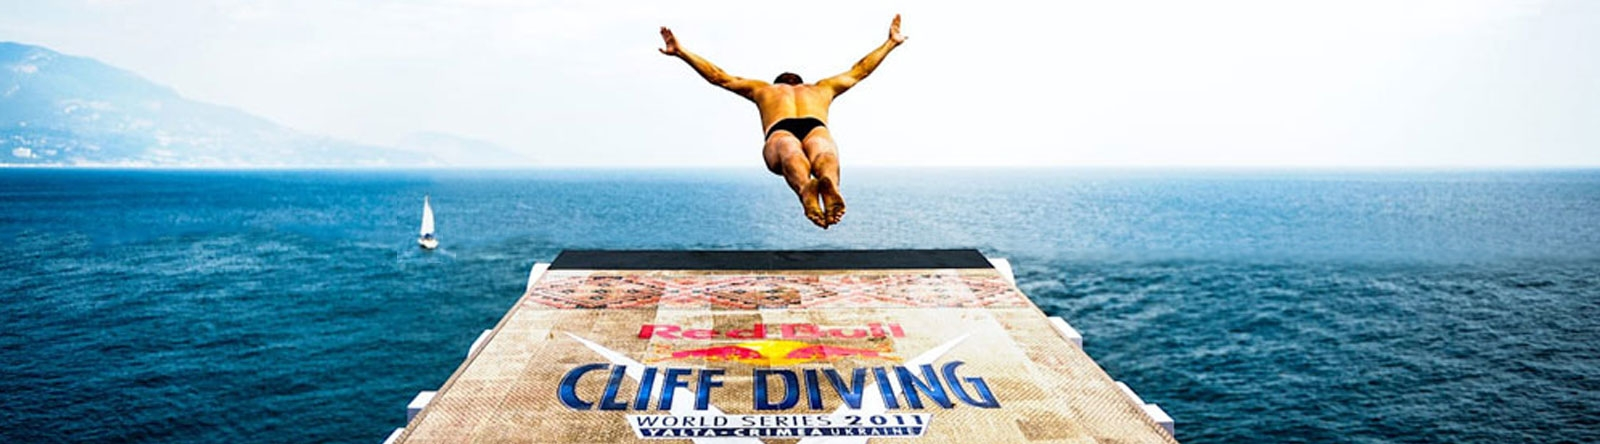 redbull-cliff-diving-saint-raphael